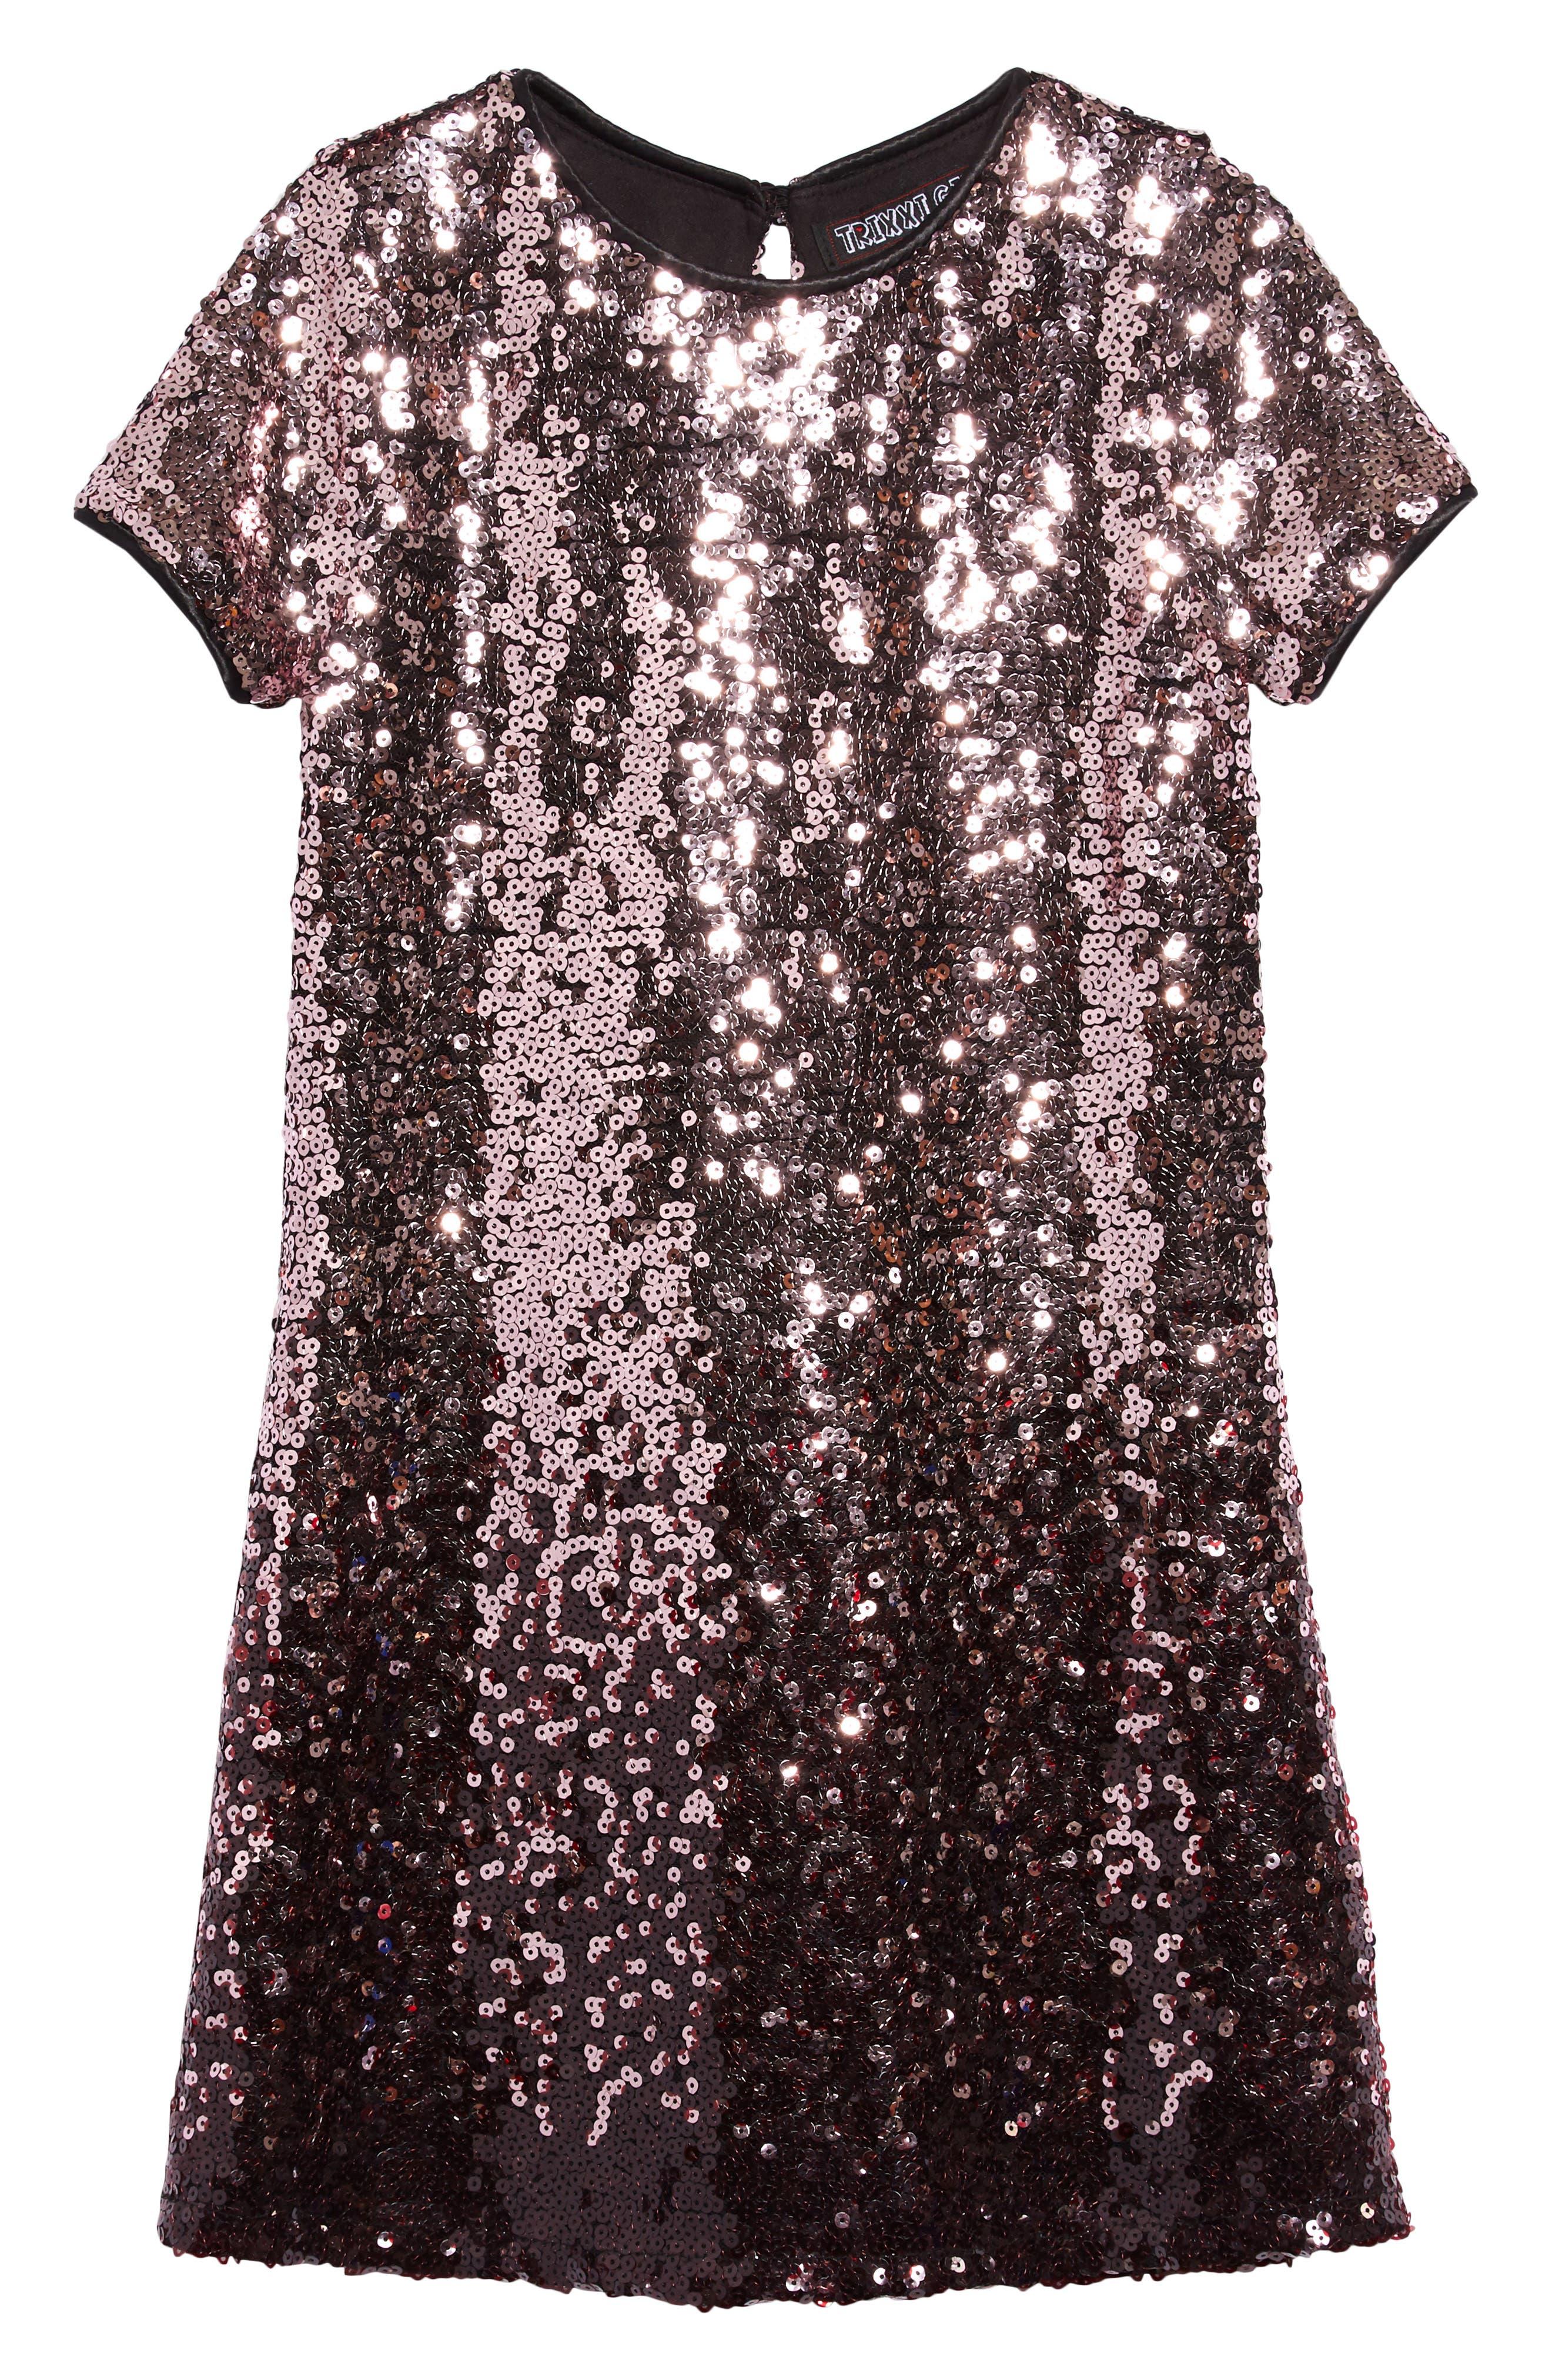 60s 70s Kids Costumes & Clothing Girls & Boys Girls Trixxi Ombre Sequin Shift Dress $58.00 AT vintagedancer.com